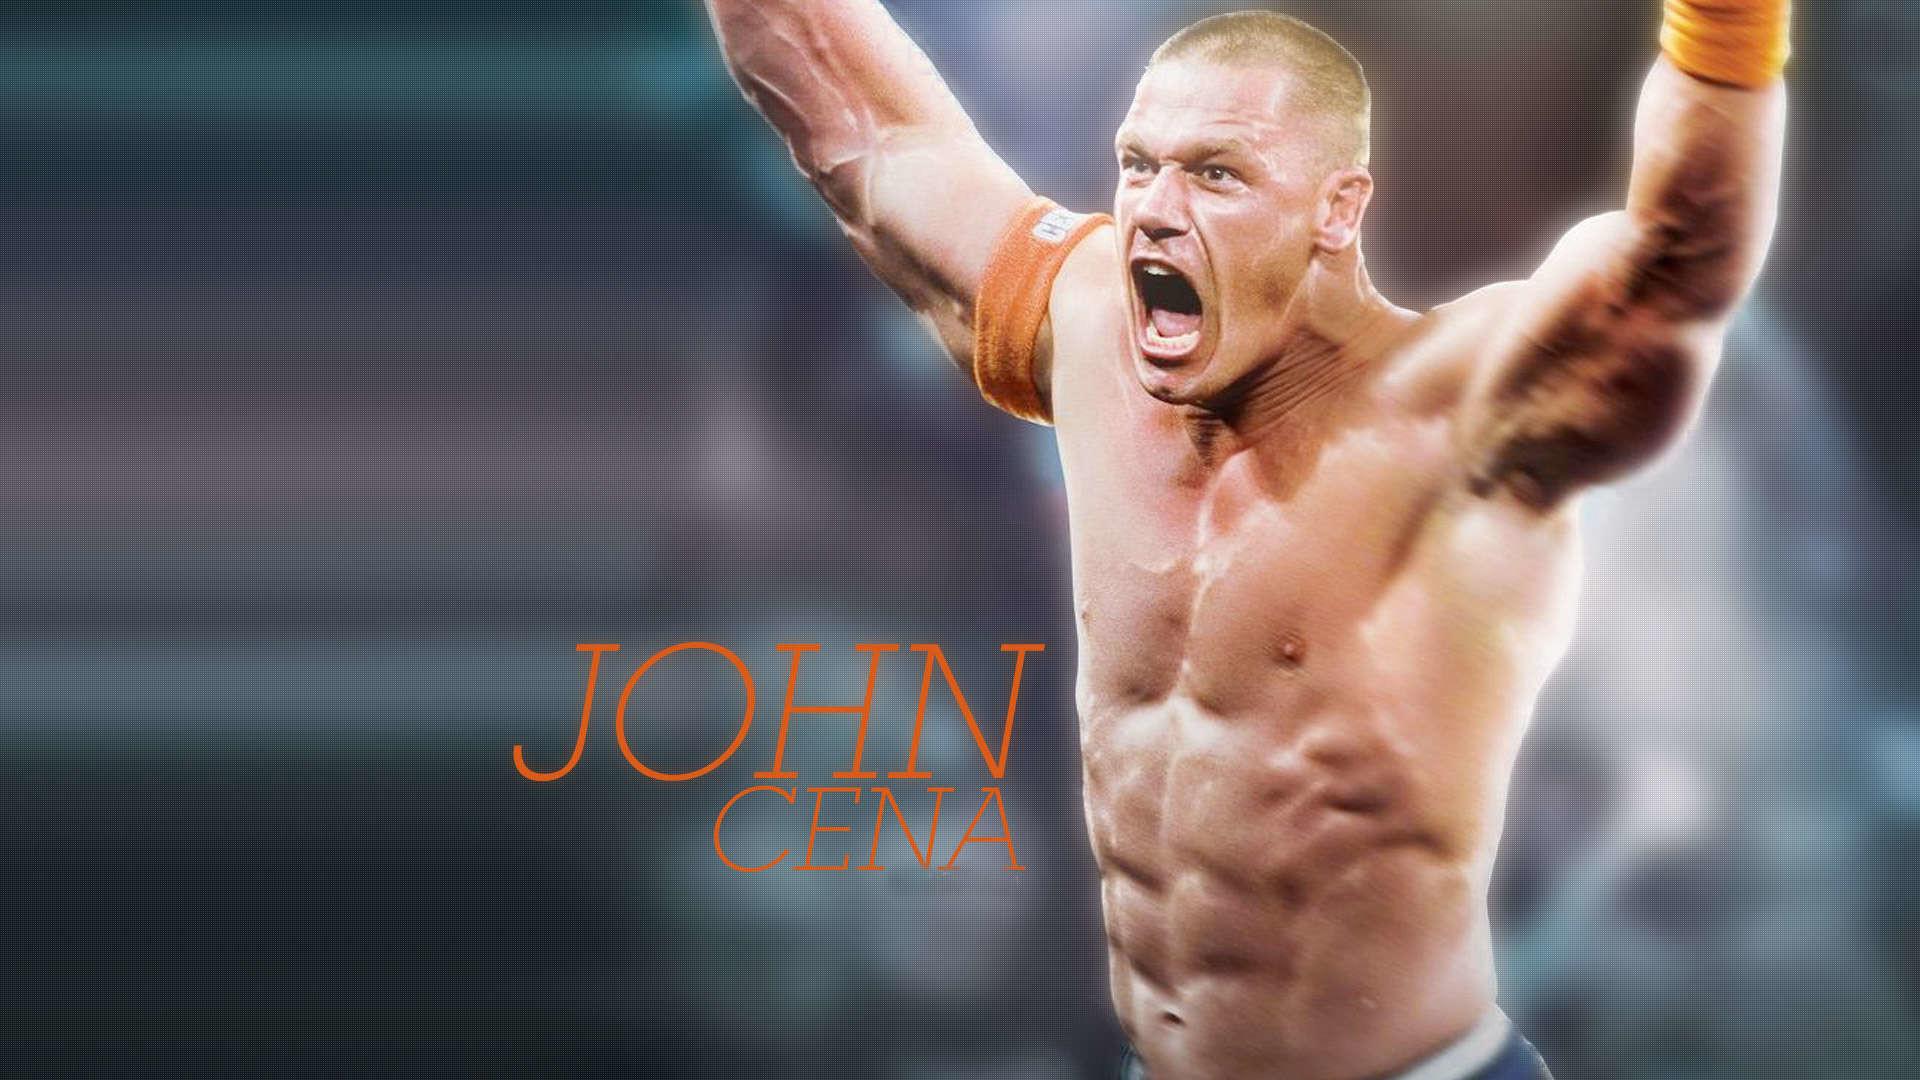 1920x1080 John Cena Wallpapers HD 2014